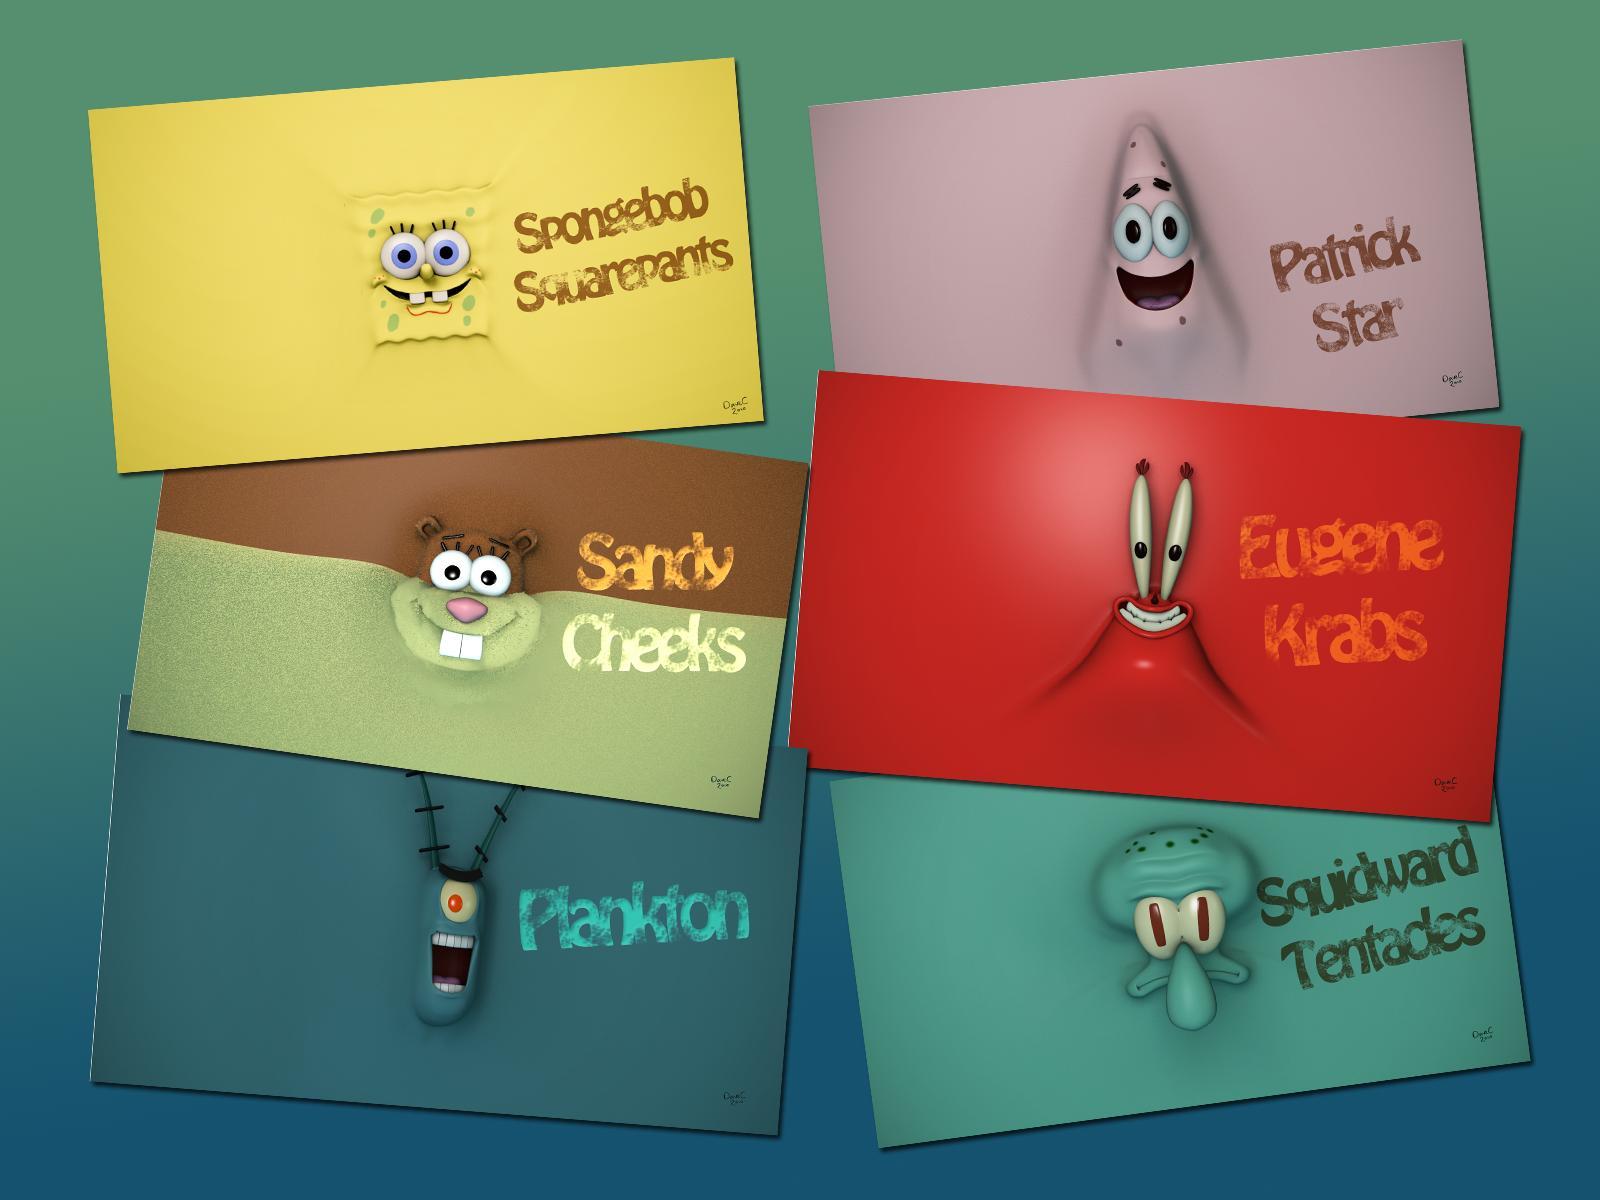 Spongebob Plankton Sea Wallpaper Desktop 242968 Hd Wallpaper Backgrounds Download